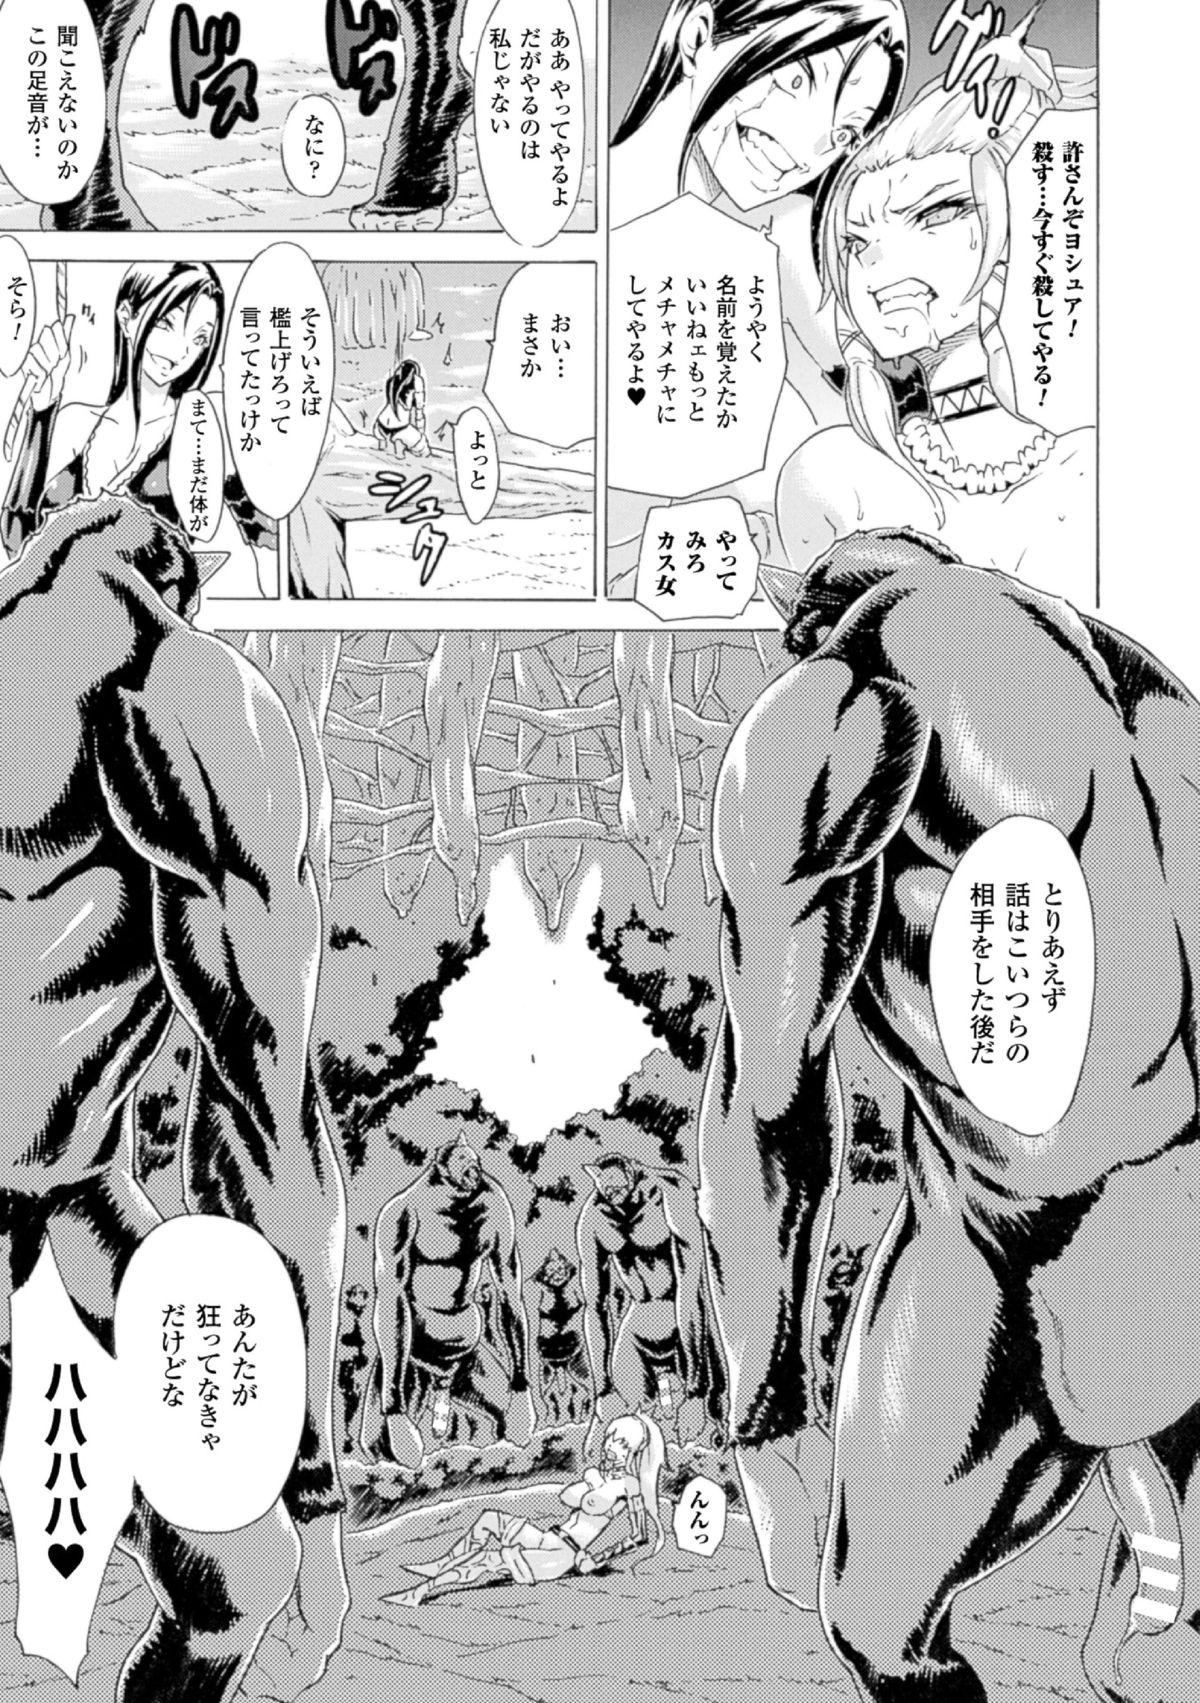 2D Comic Magazine Hunter Heroine AntholoG Vol.1 36